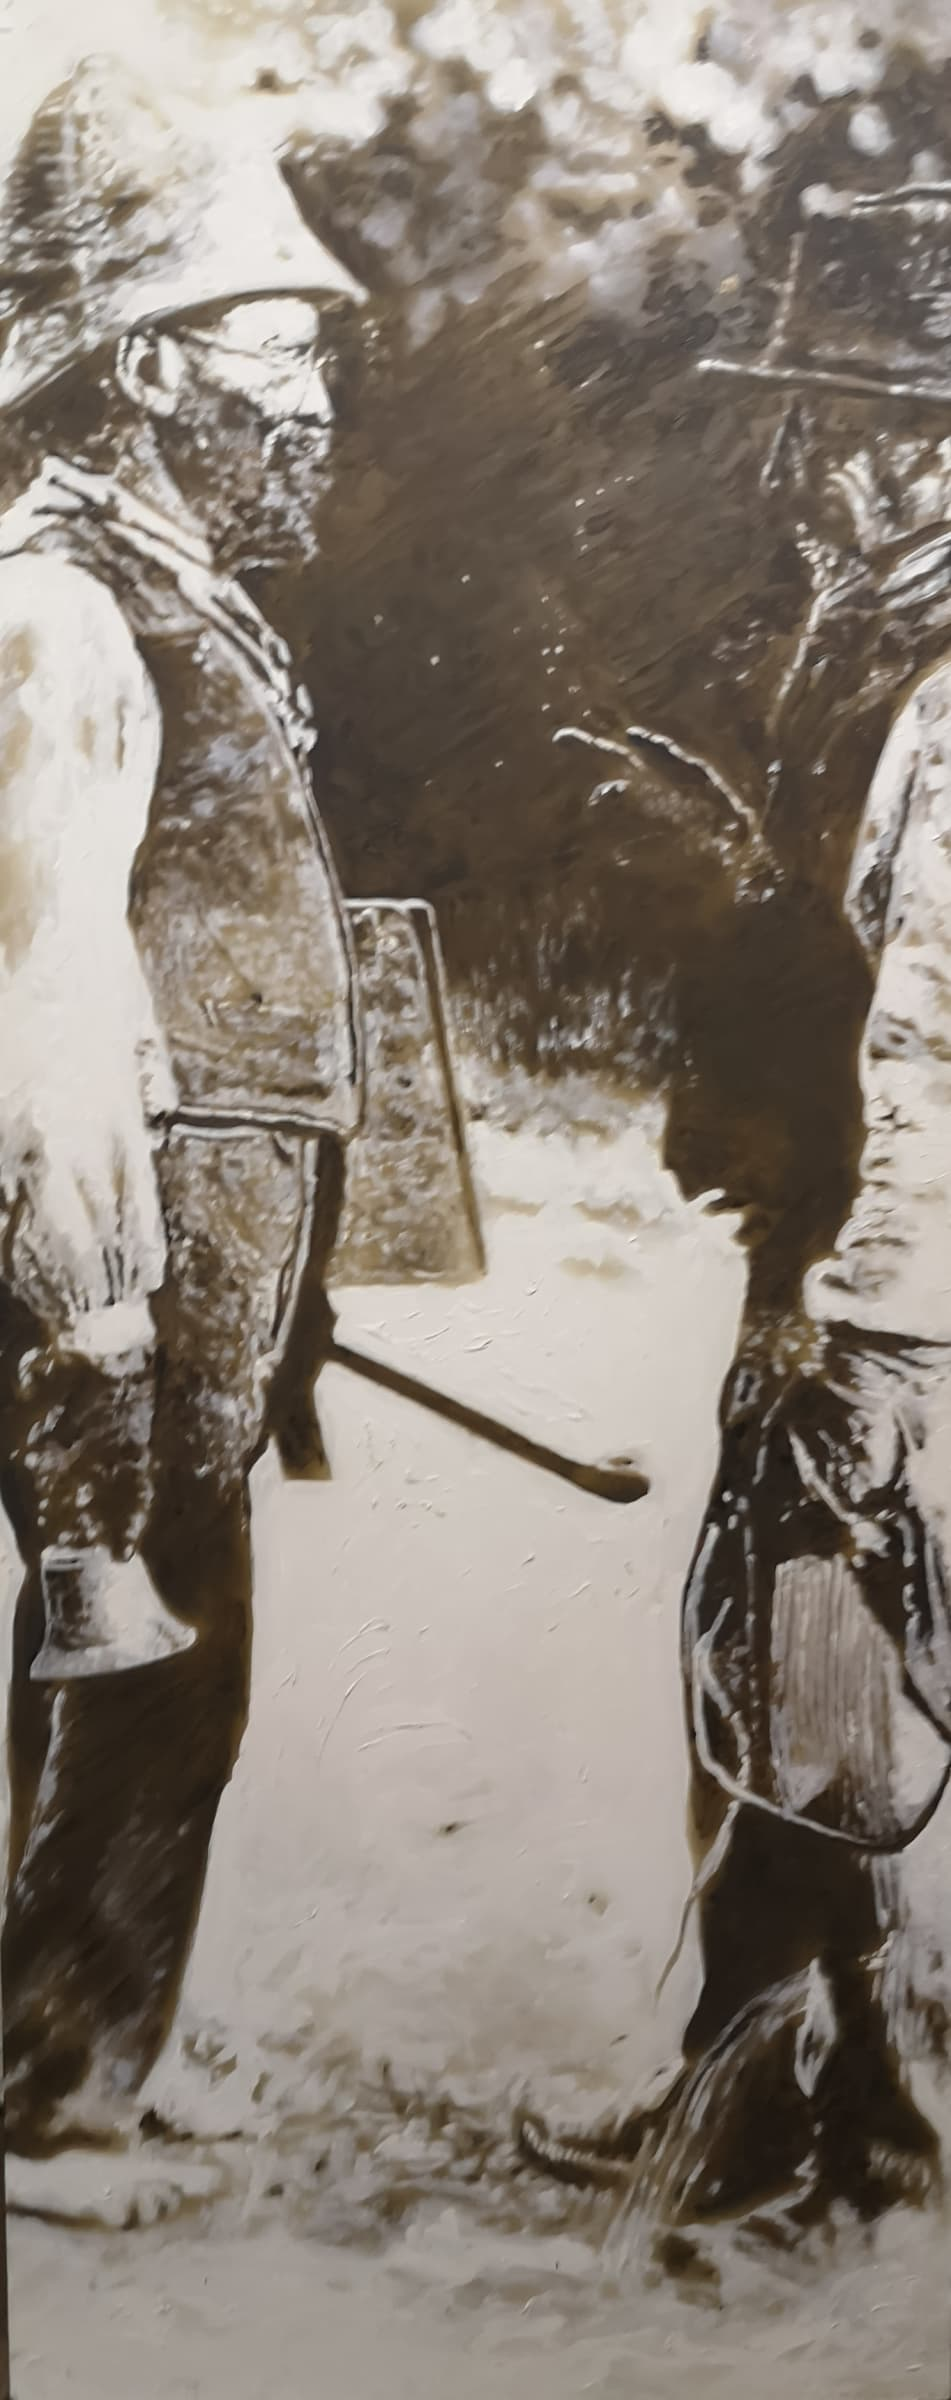 <span class=&#34;link fancybox-details-link&#34;><a href=&#34;/artists/73-sascha-%26-tashi-stylianou/works/3173-sascha-tashi-stylianou-at-a-glance-2015/&#34;>View Detail Page</a></span><div class=&#34;artist&#34;><strong>Sascha & Tashi Stylianou</strong></div> <div class=&#34;title&#34;><em>At A Glance</em>, 2015</div> <div class=&#34;medium&#34;>Oils & Acrylic Spray On Reclaimed Door </div> <div class=&#34;dimensions&#34;>201cm x 81.5cm x 4cm</div><div class=&#34;price&#34;>R10,000.00</div>